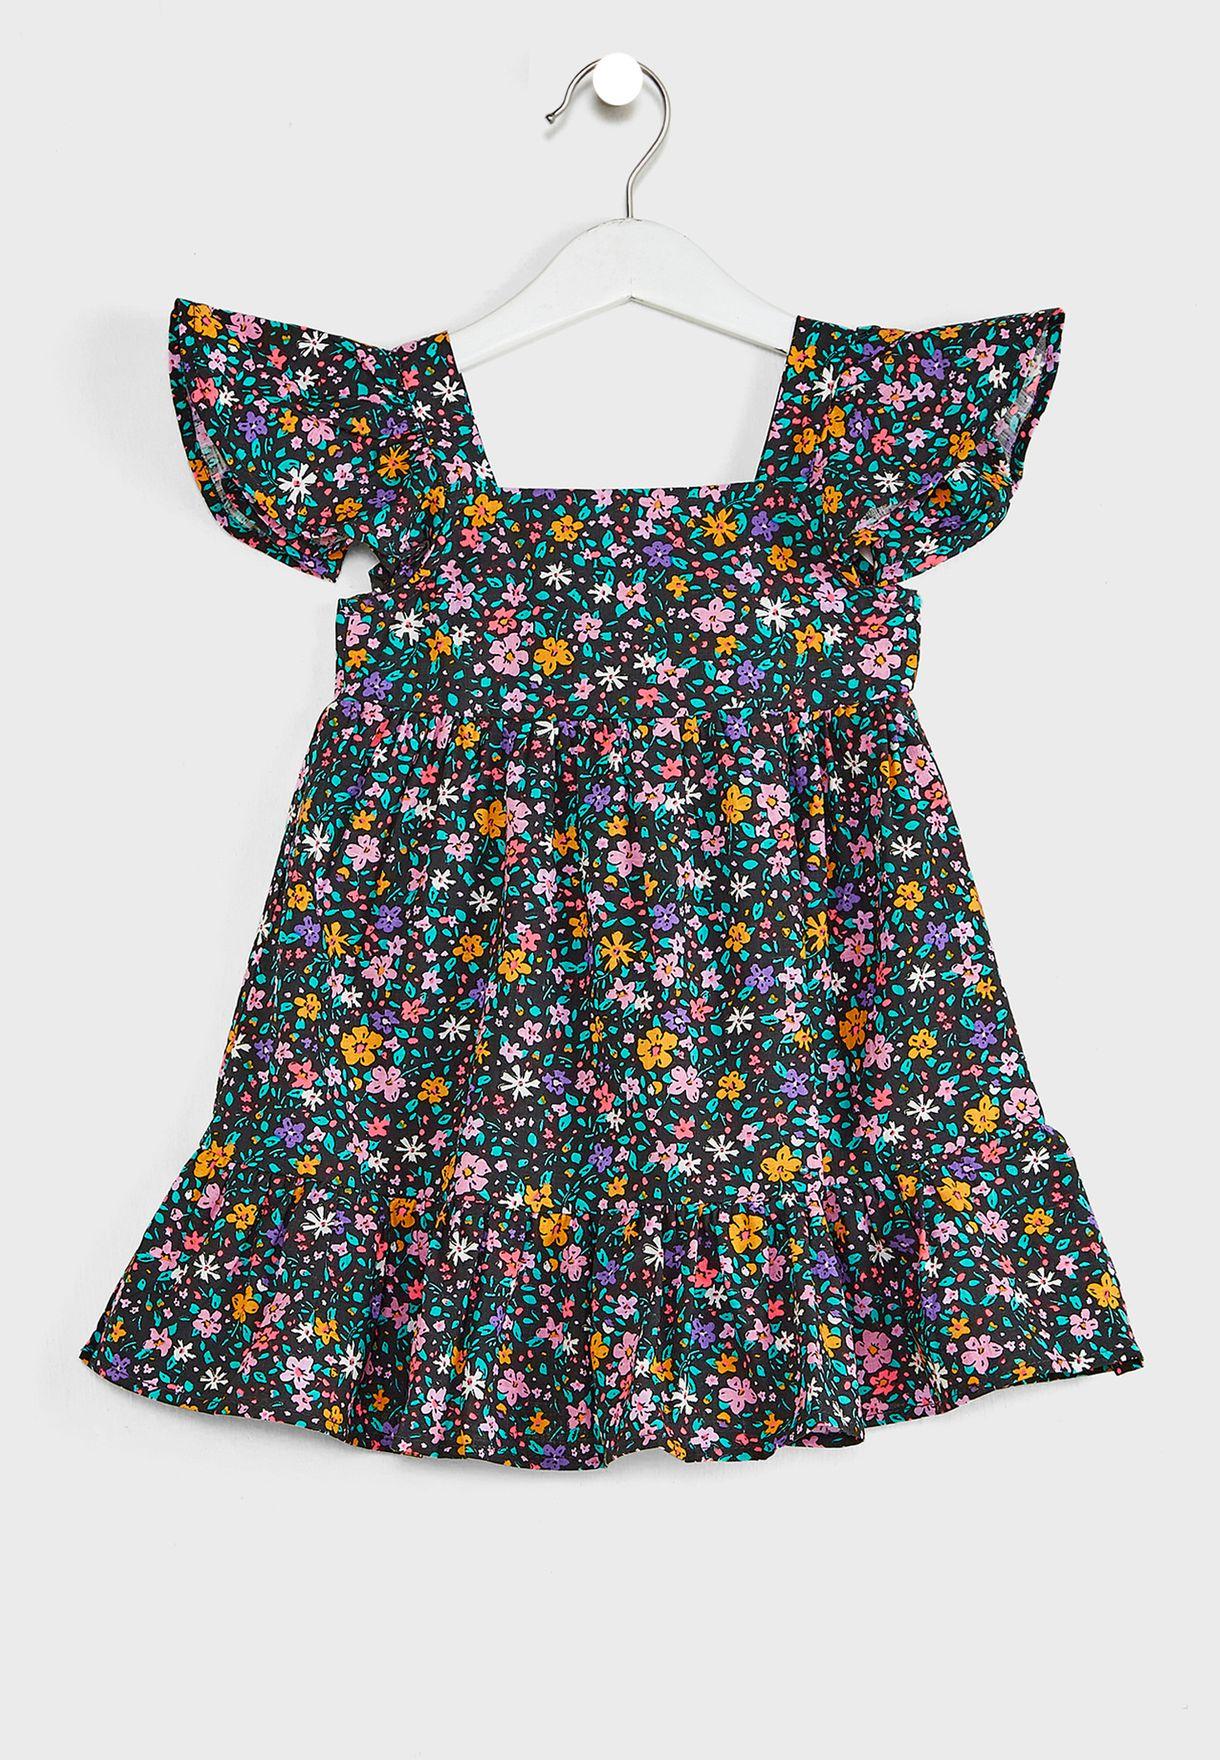 Kids Sprinkled Ditsy Ruffle Detail Dress